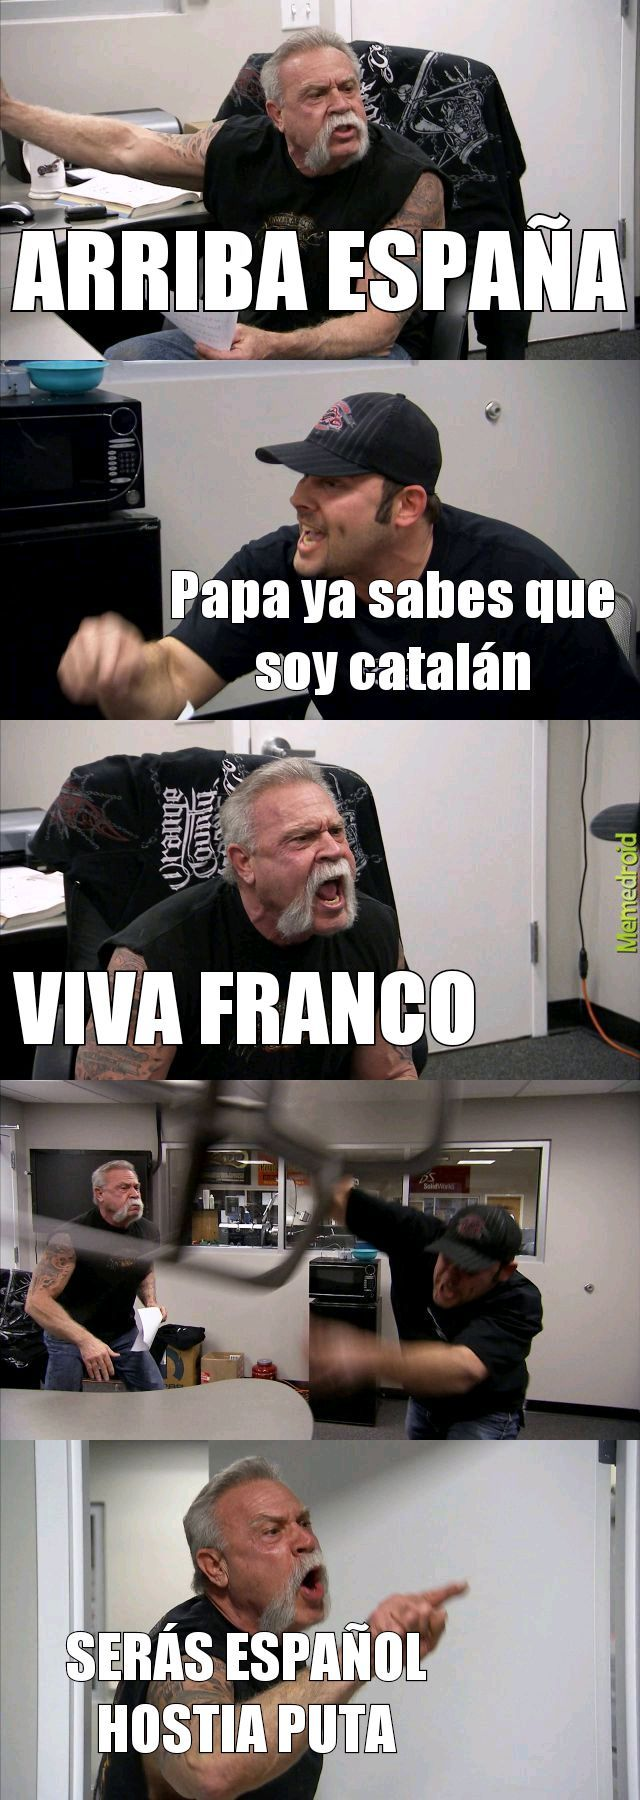 Español suuuuper estereotipado - meme